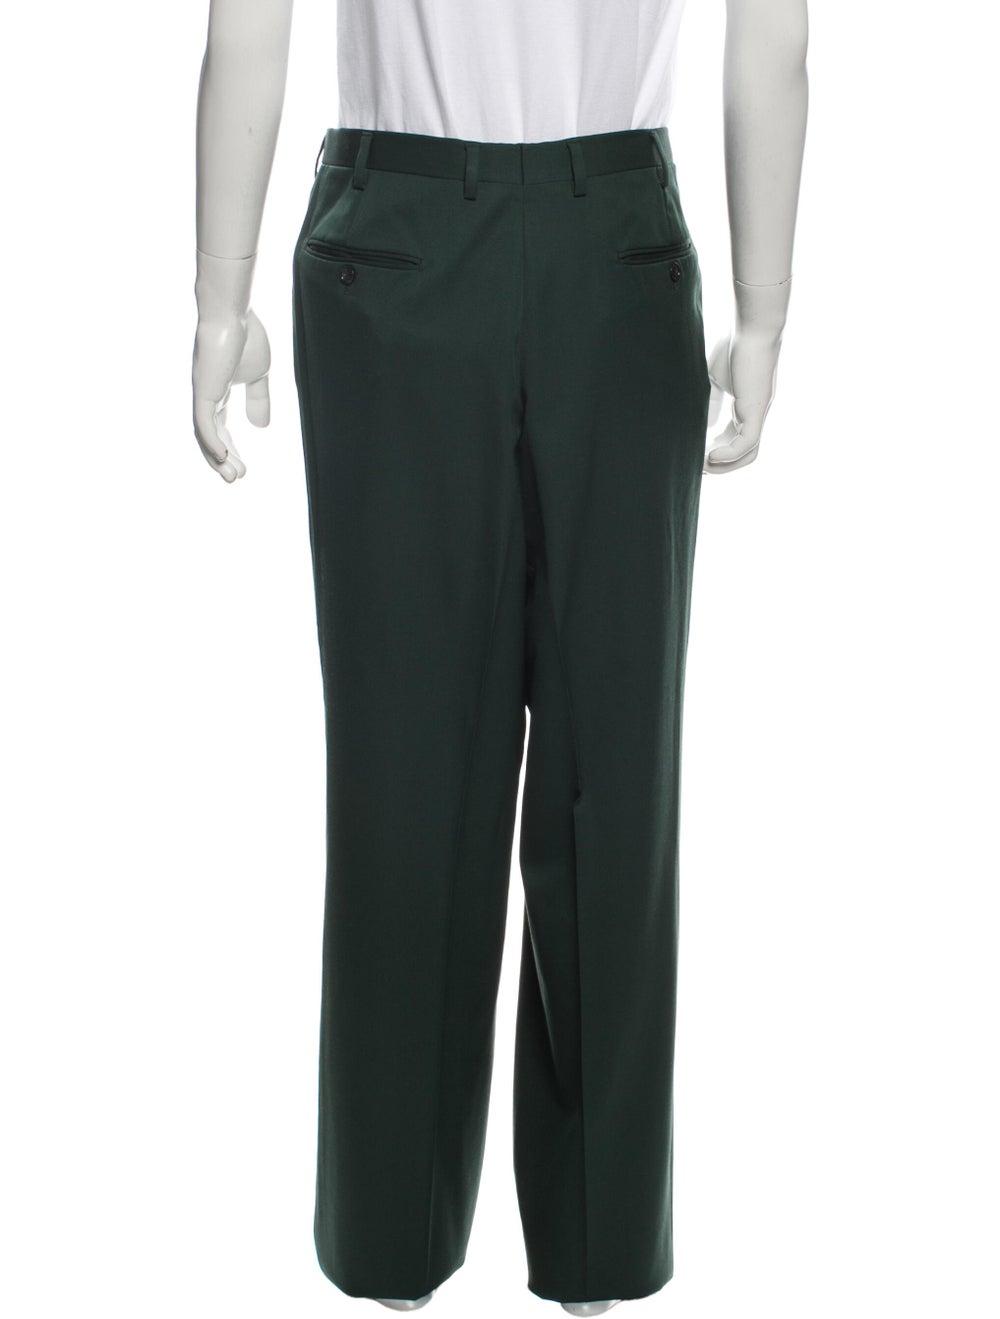 Bijan Pants Green - image 3